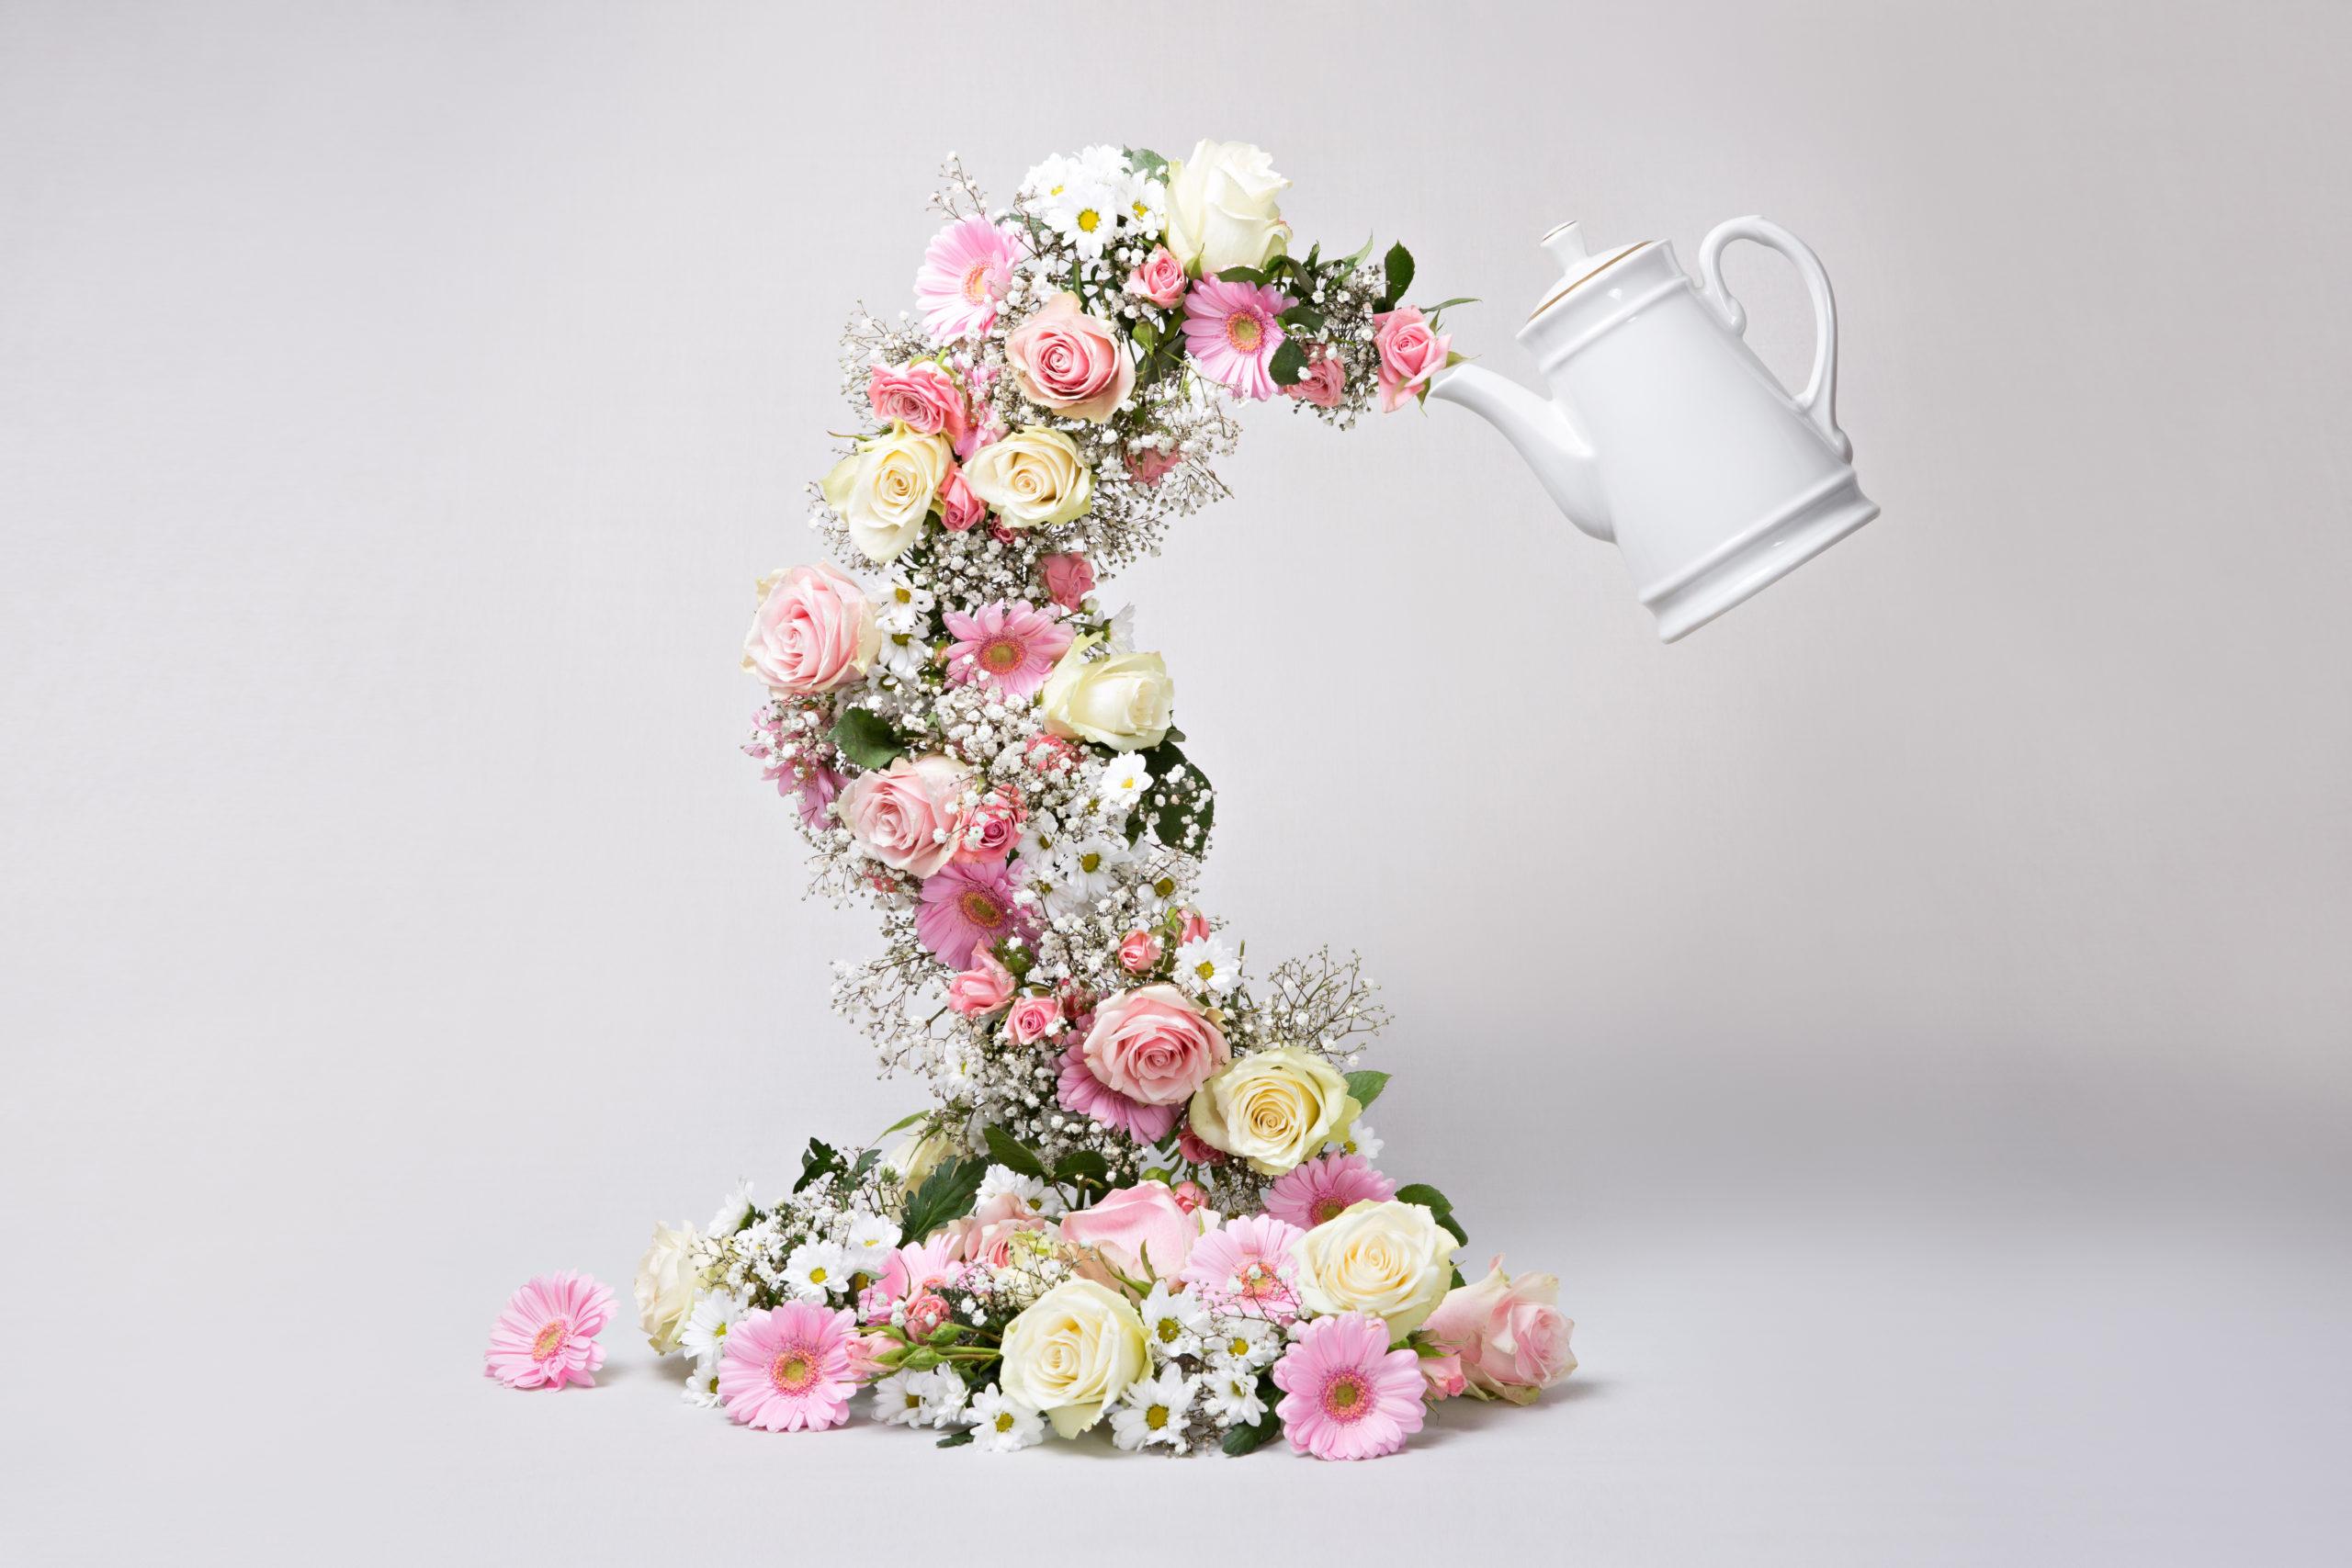 Sarah Baboro Photographe Shooting Photo Lille Nature Morte Composition Flowers Fleurs